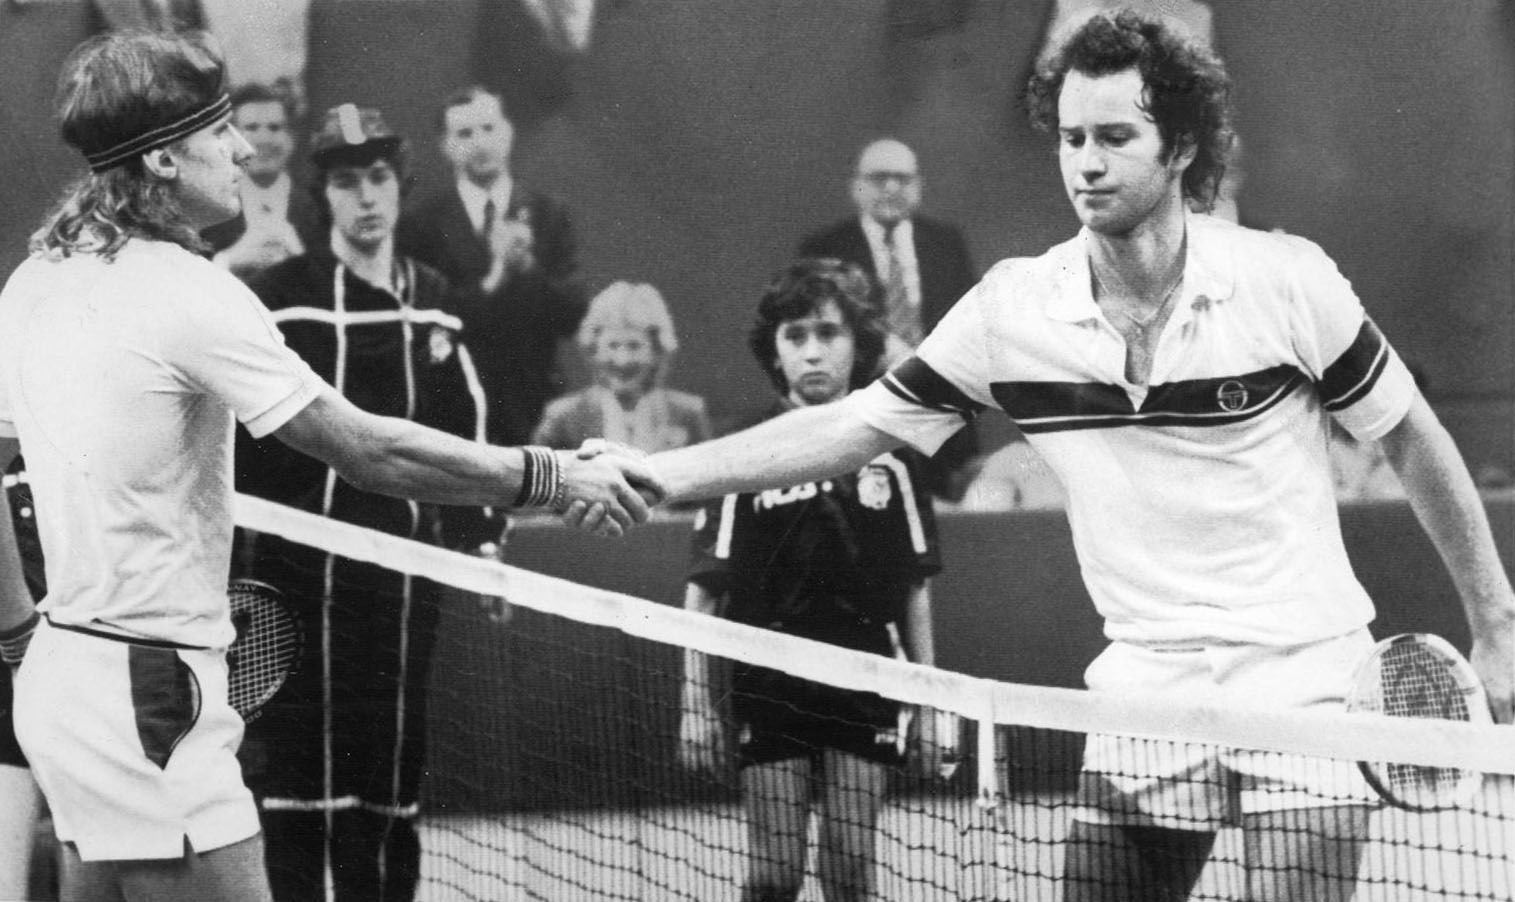 In the News About Tennis Legends Björn Borg vs John McEnroe